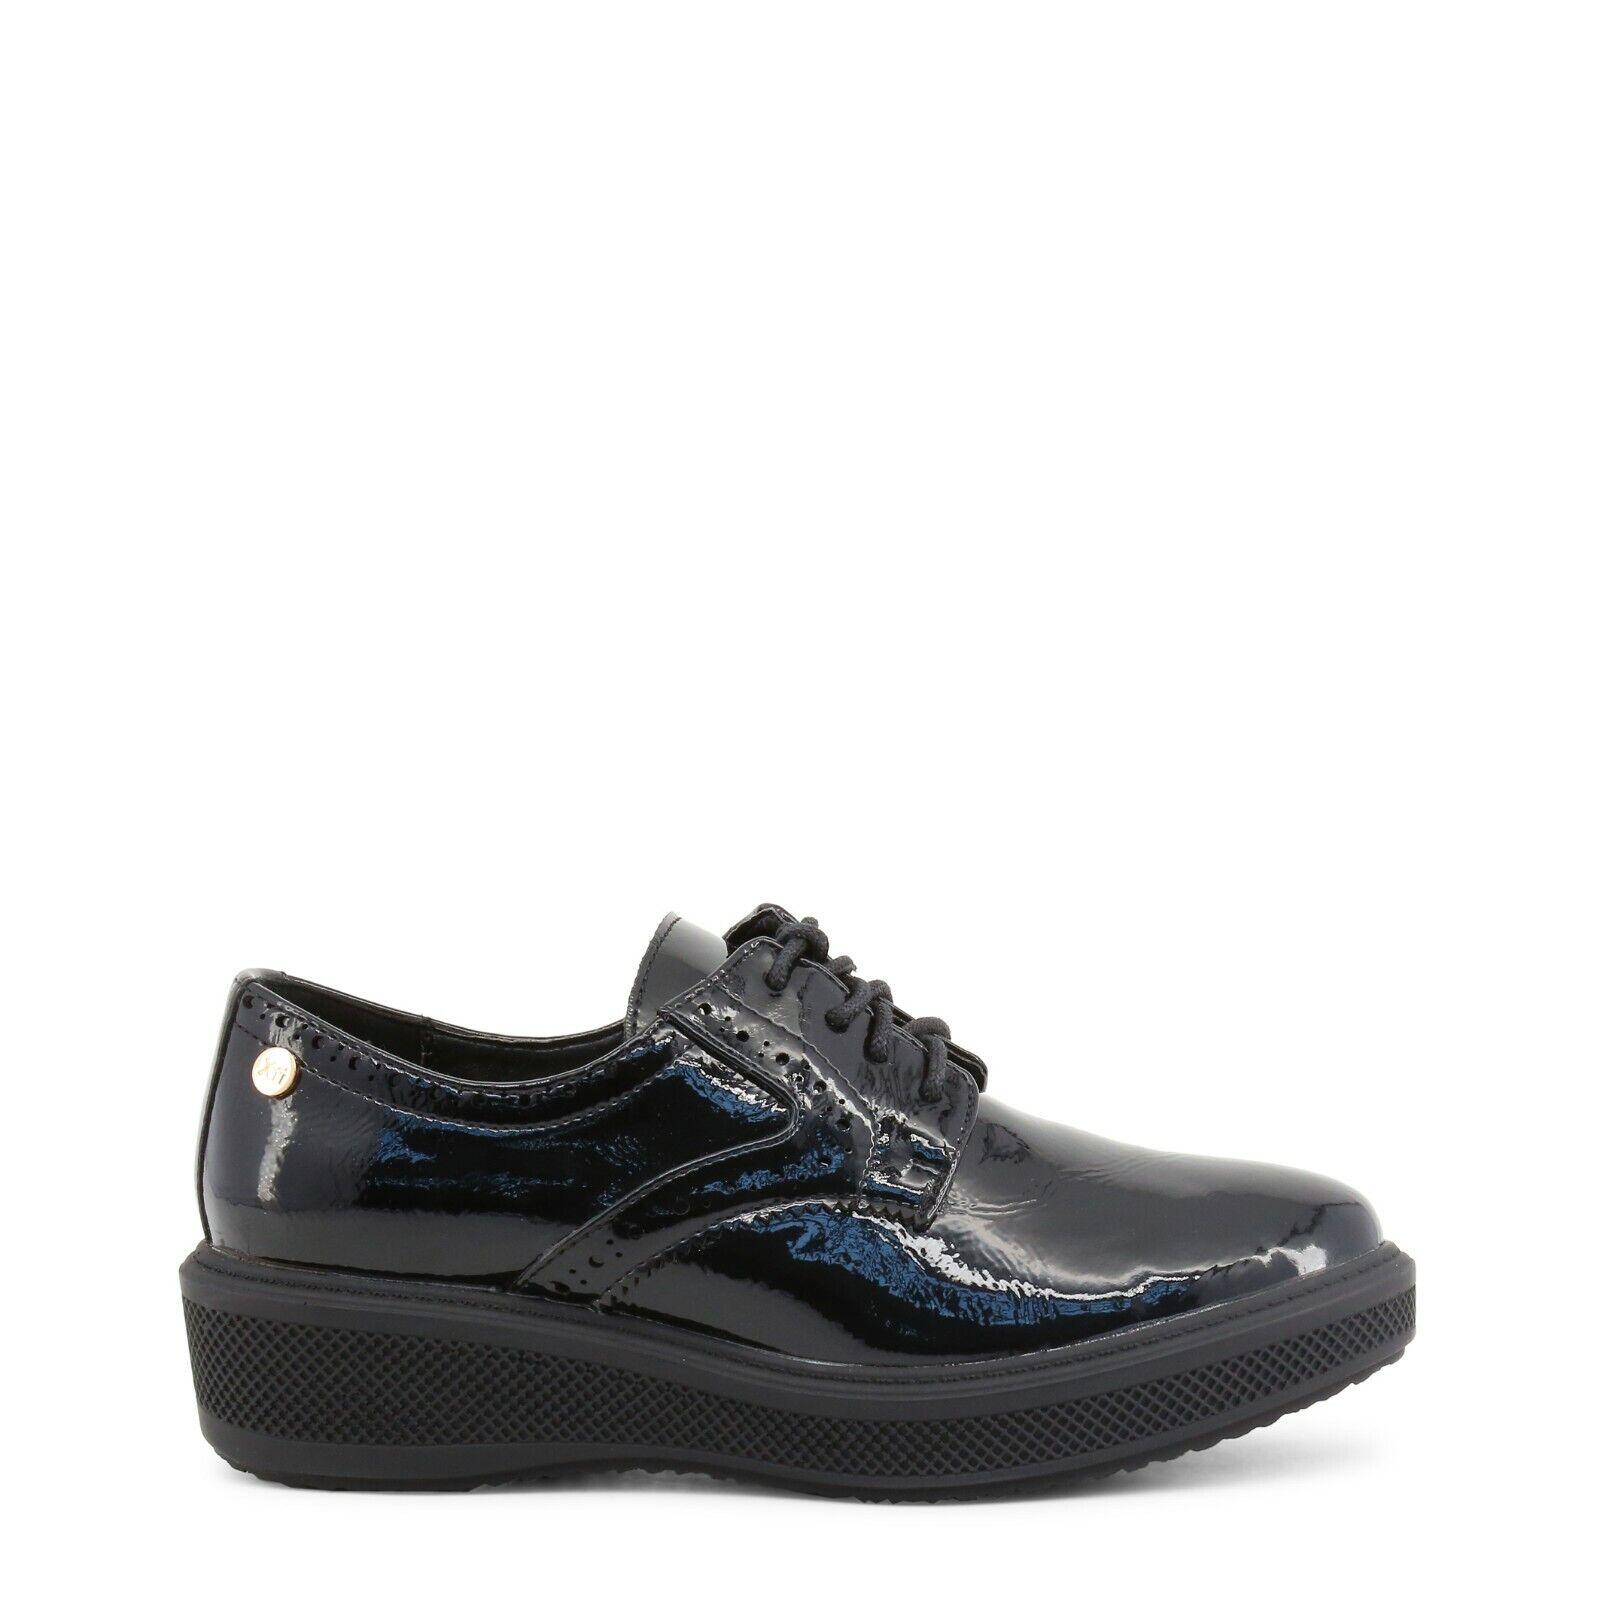 BNIB XTI Black Patent Lace Up Flat Low Wedge Heel Brogue shoes Sz 7 Work School